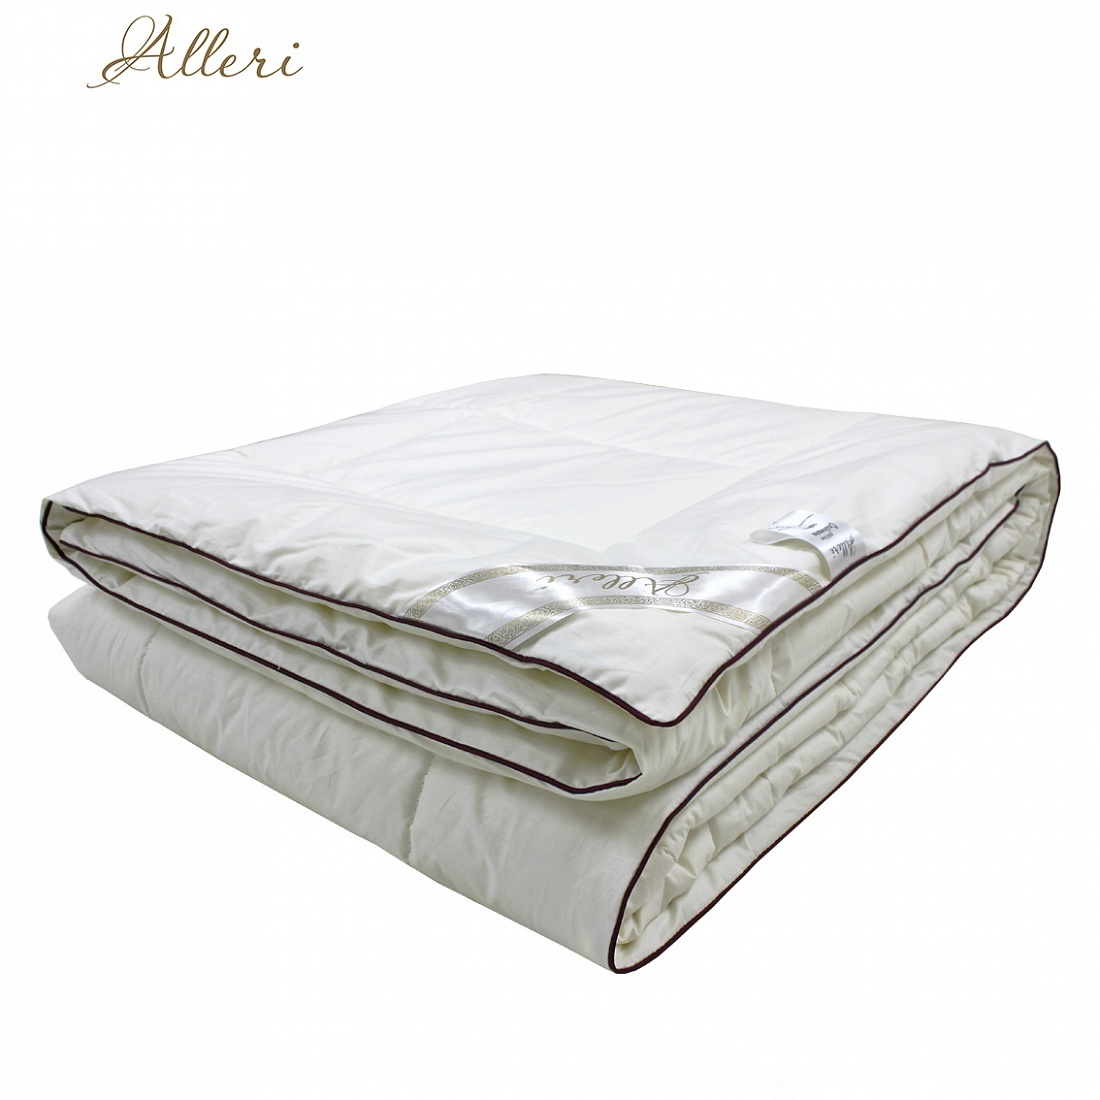 Одеяло Козий пух (ТИК), 300 гр